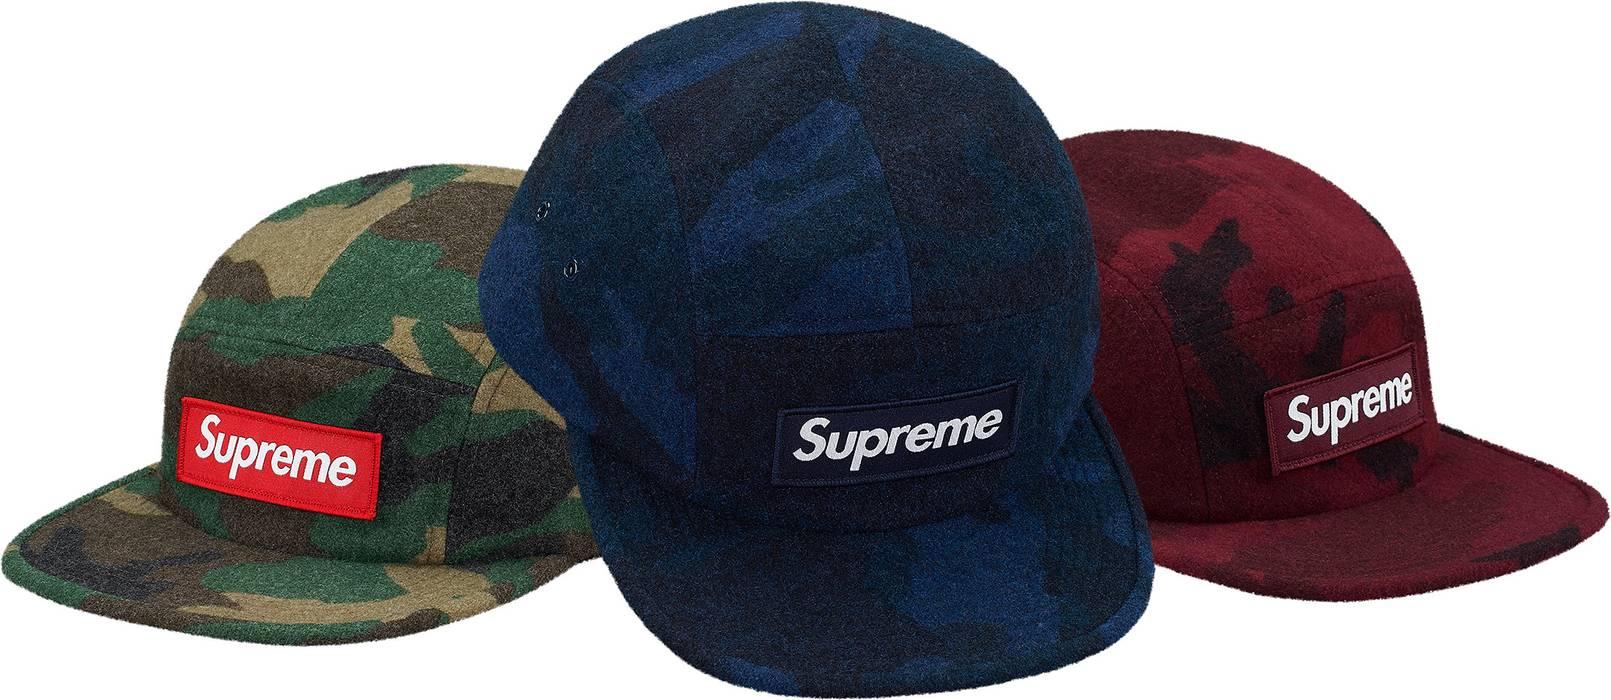 Supreme Supreme Camo Wool Camp Cap (Navy) Box Logo Size one size ... 5295af8f188